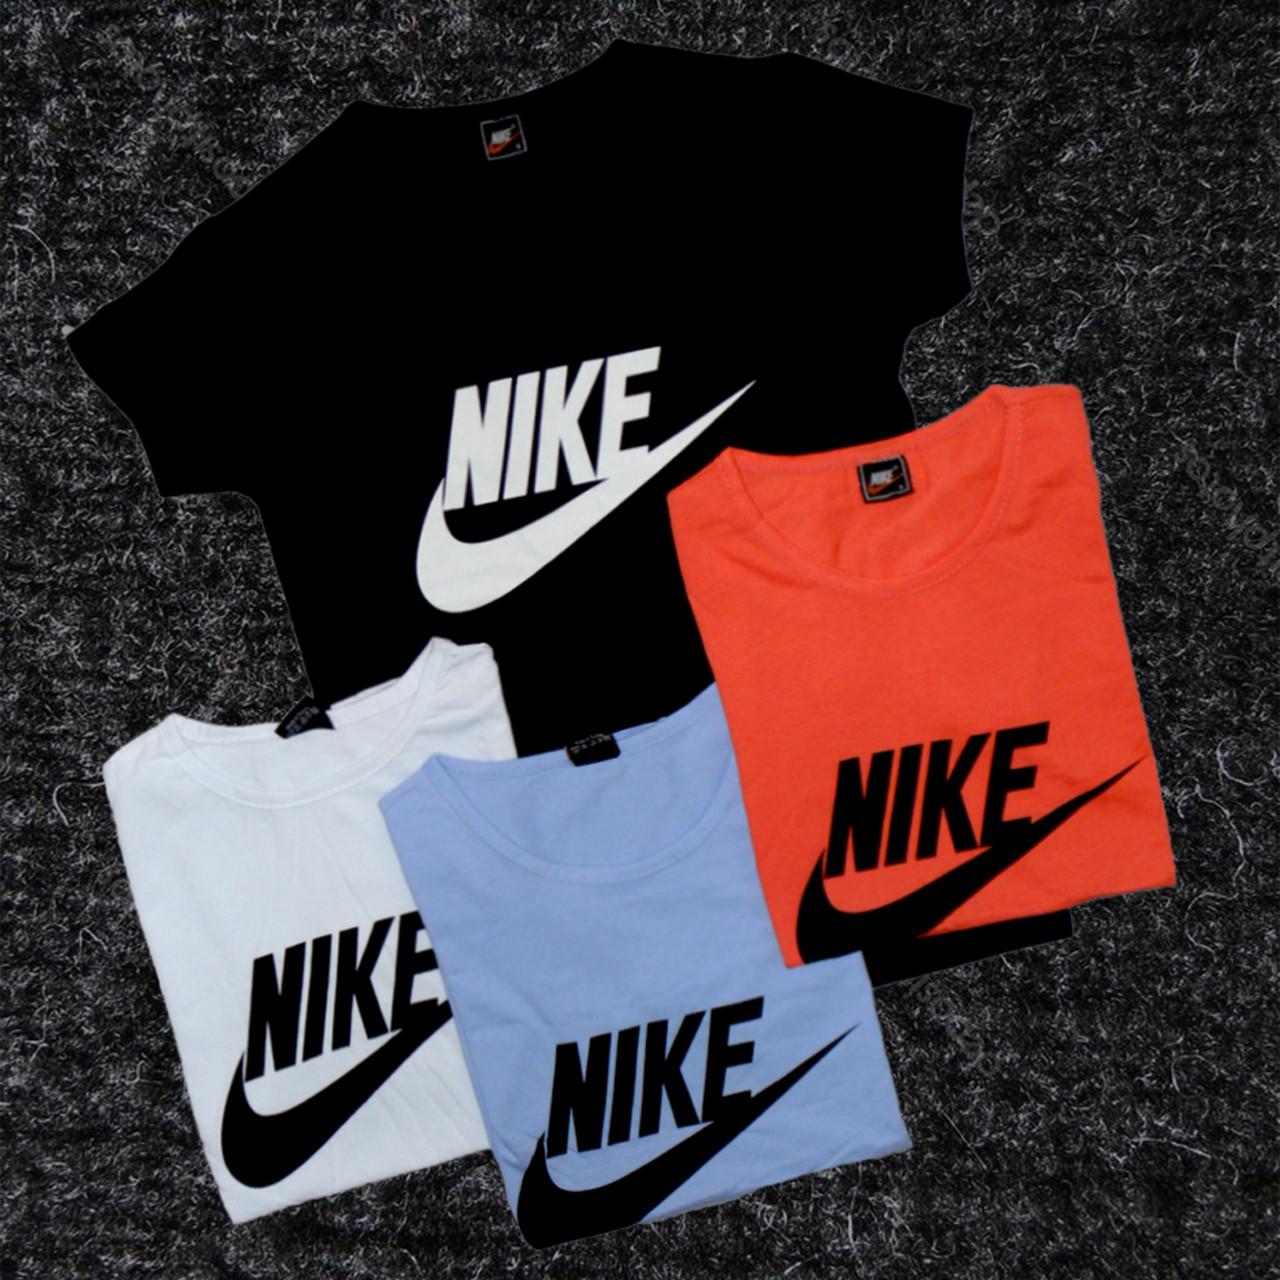 5ee93487 Женская футболка NIKE , белая, черная, голубая, оранжевая . футболки ...